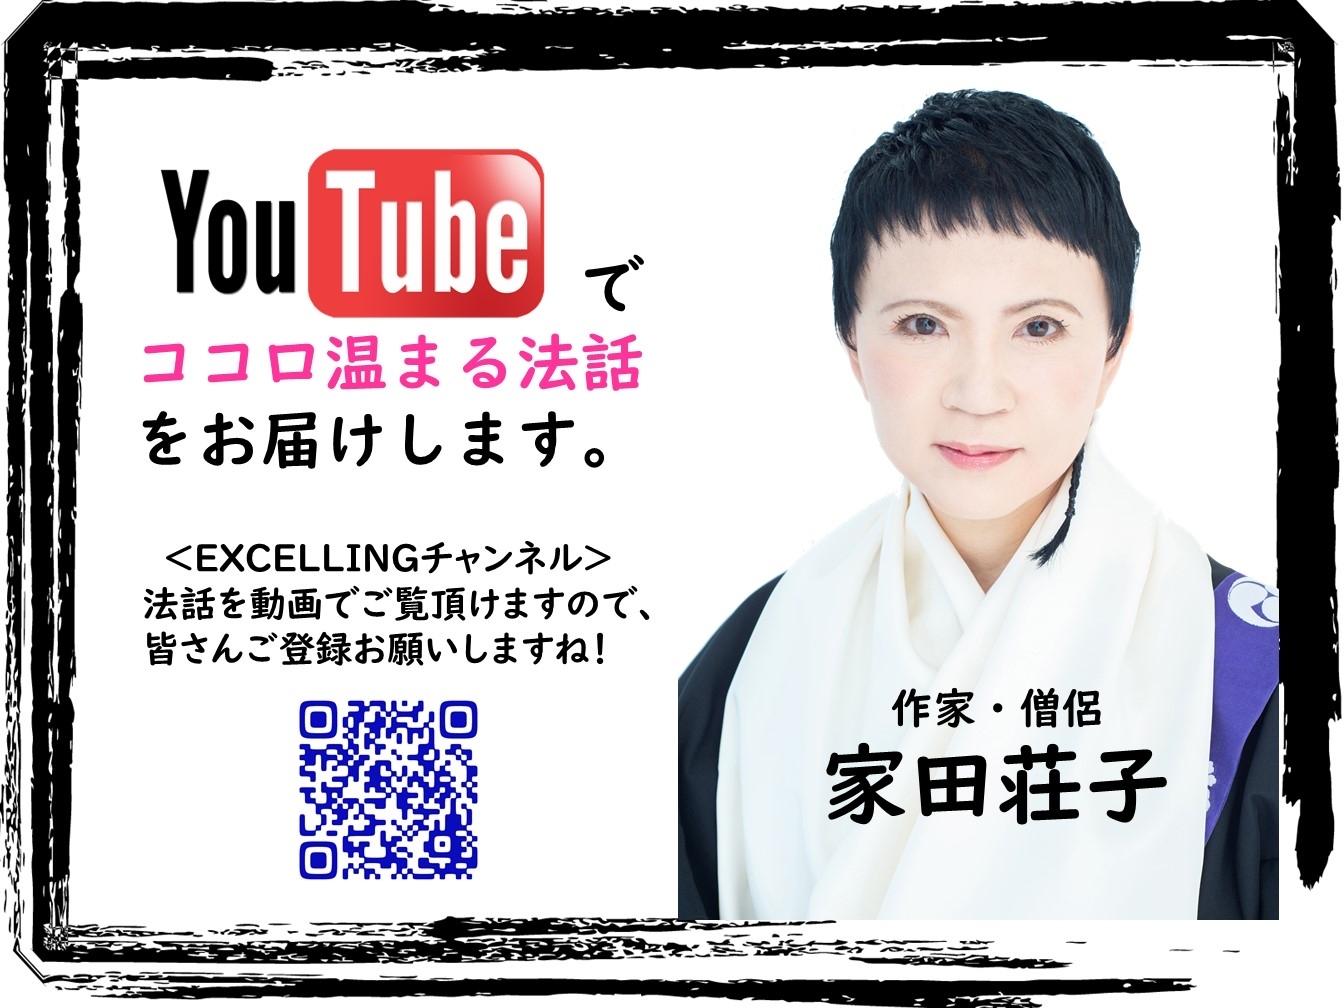 YouTube ココロの法話 5回目_d0339676_16234311.jpg